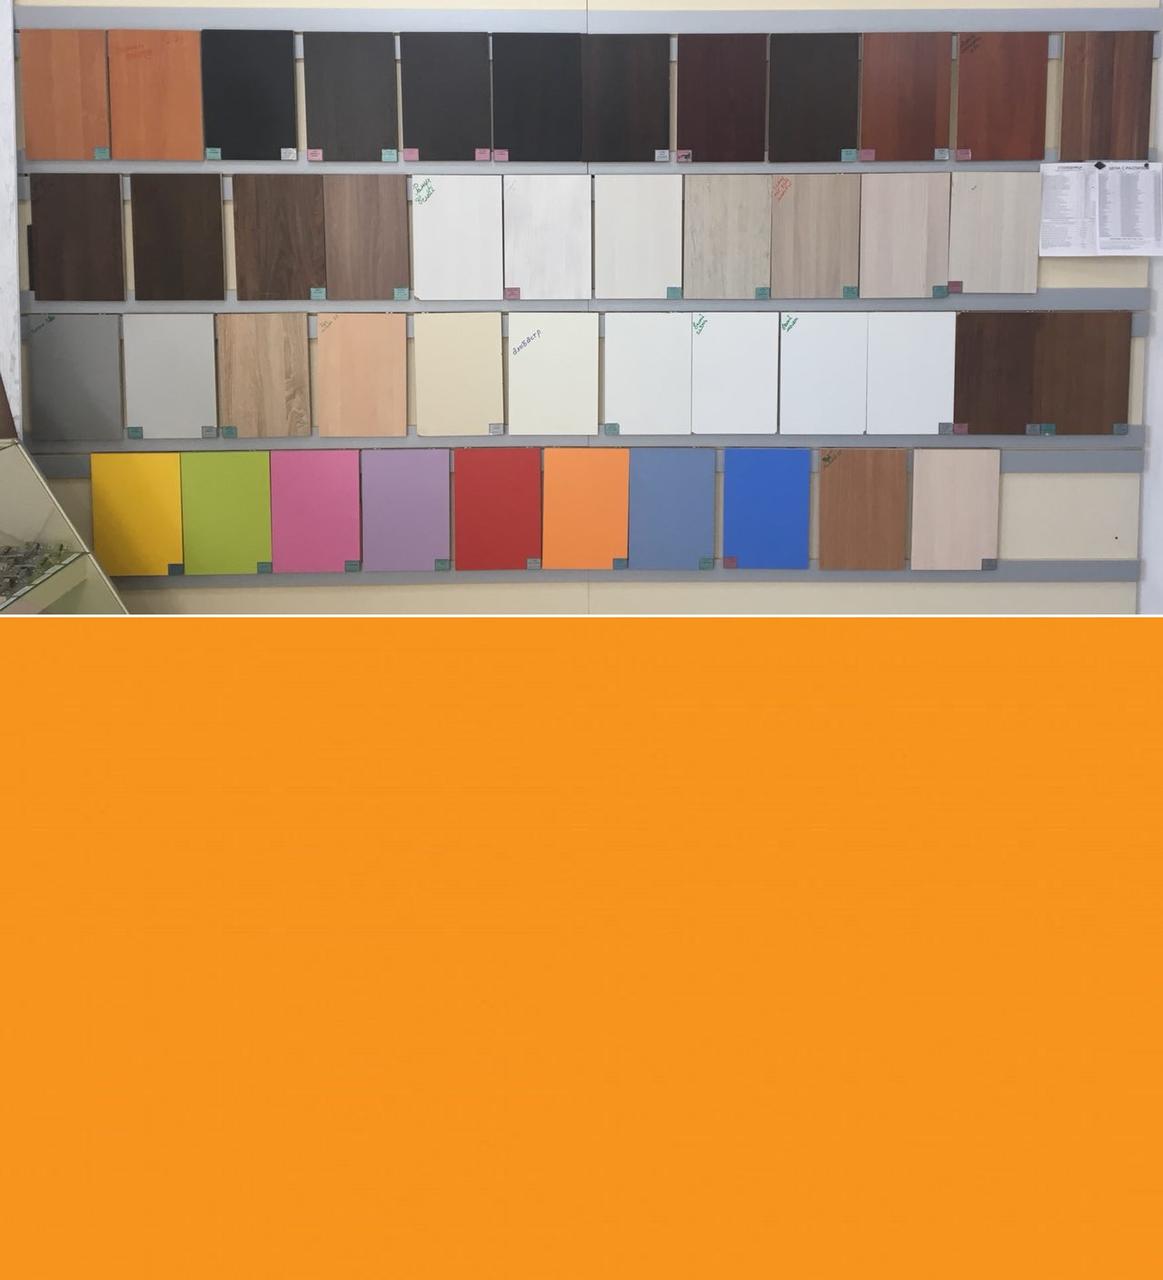 ЛДСП Оранж (цена с распилом)  2750*1830*16, 2500*1830*16  мм